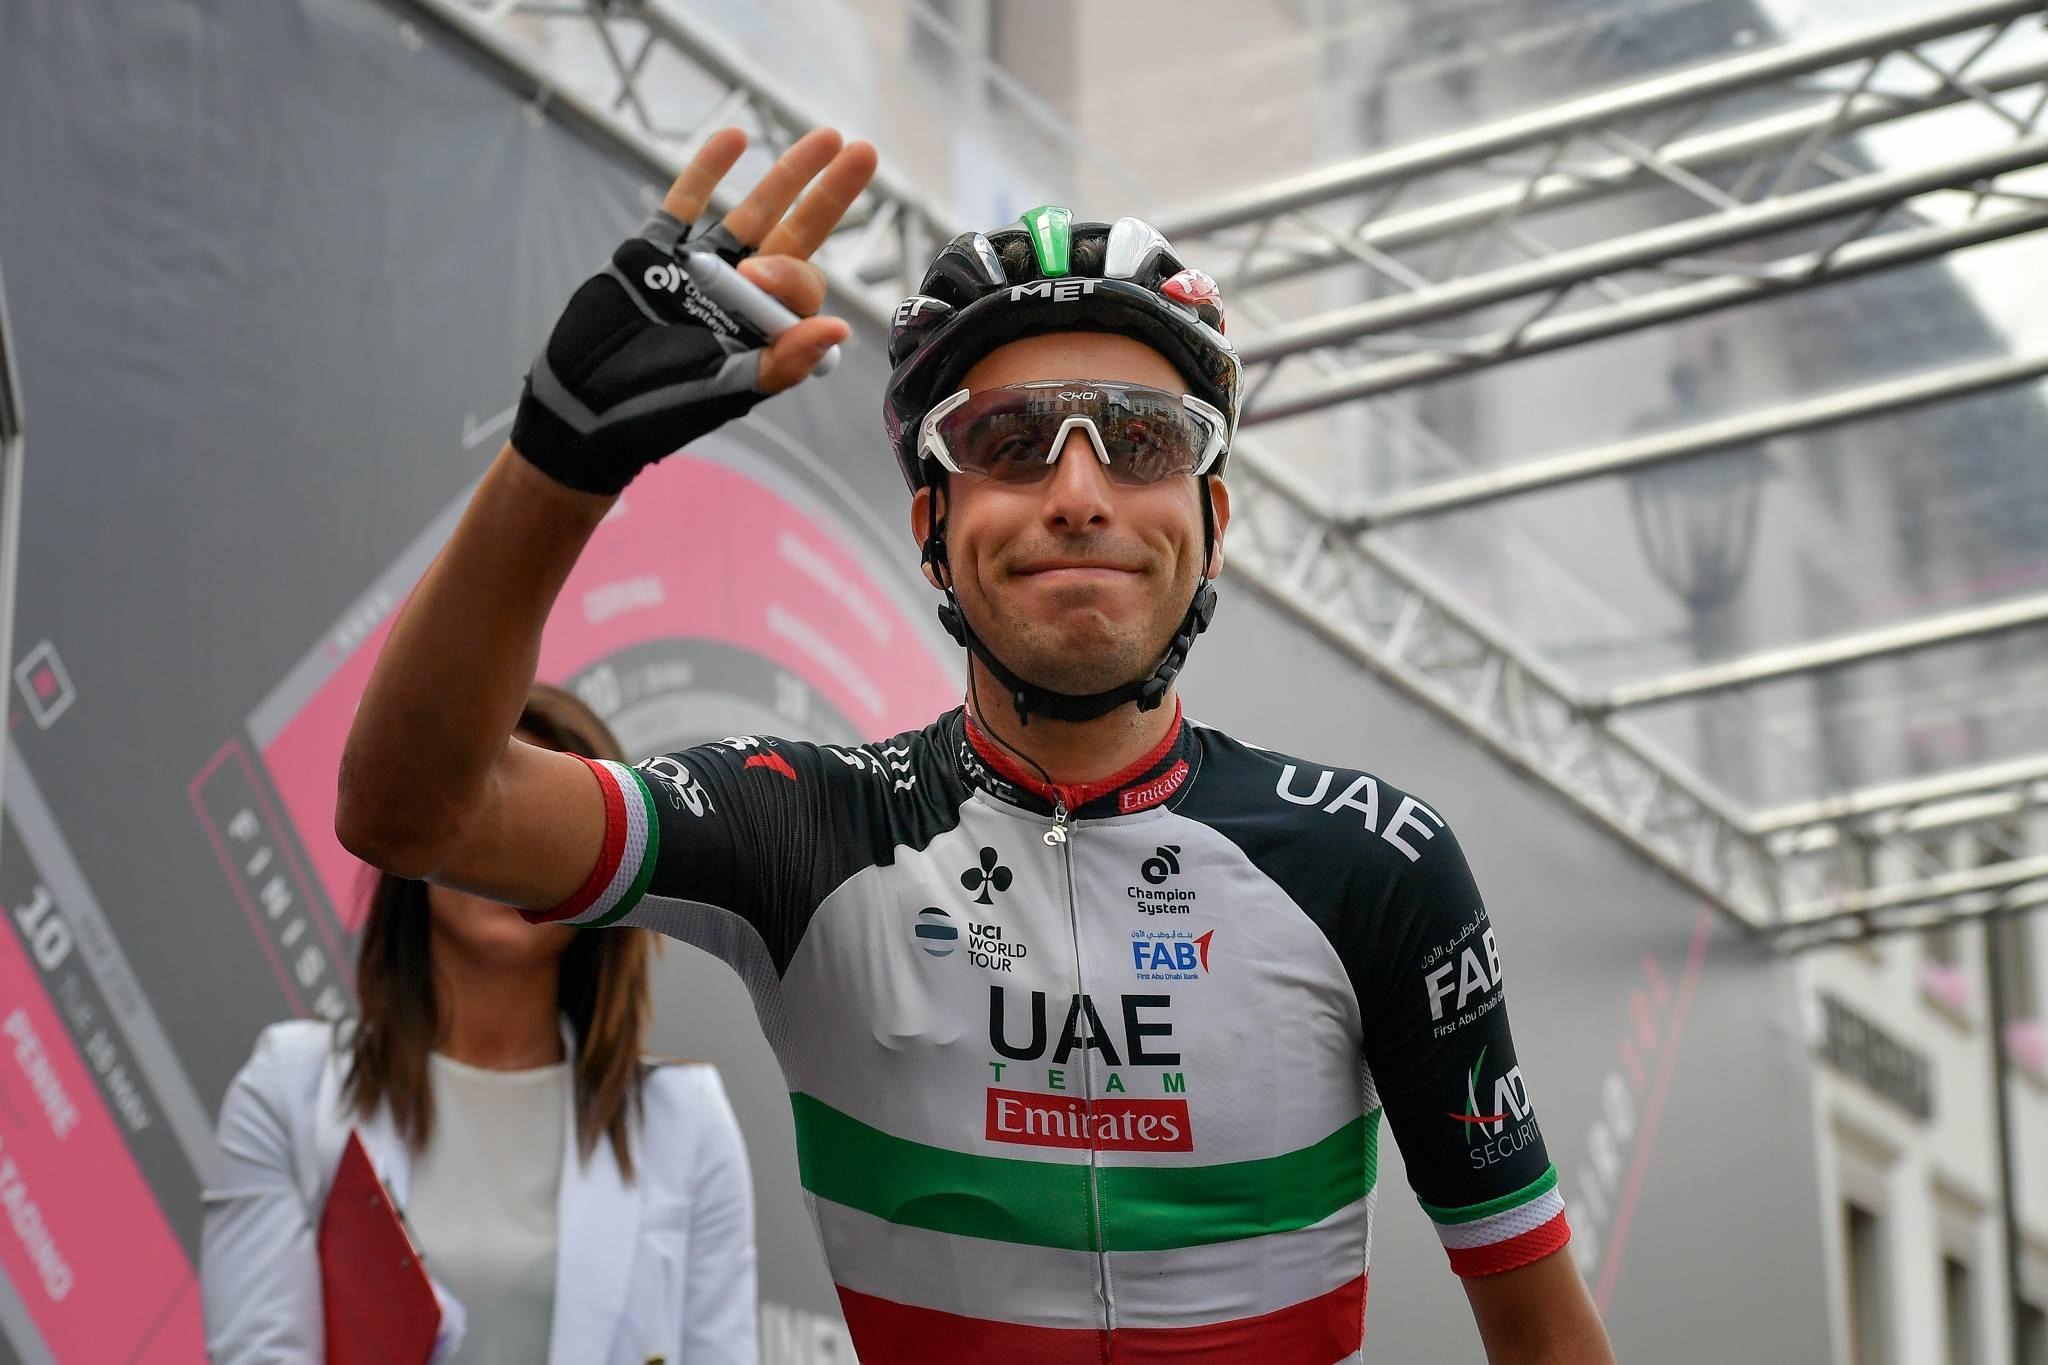 UAE Emirates Fabio Aru JoanSeguidor